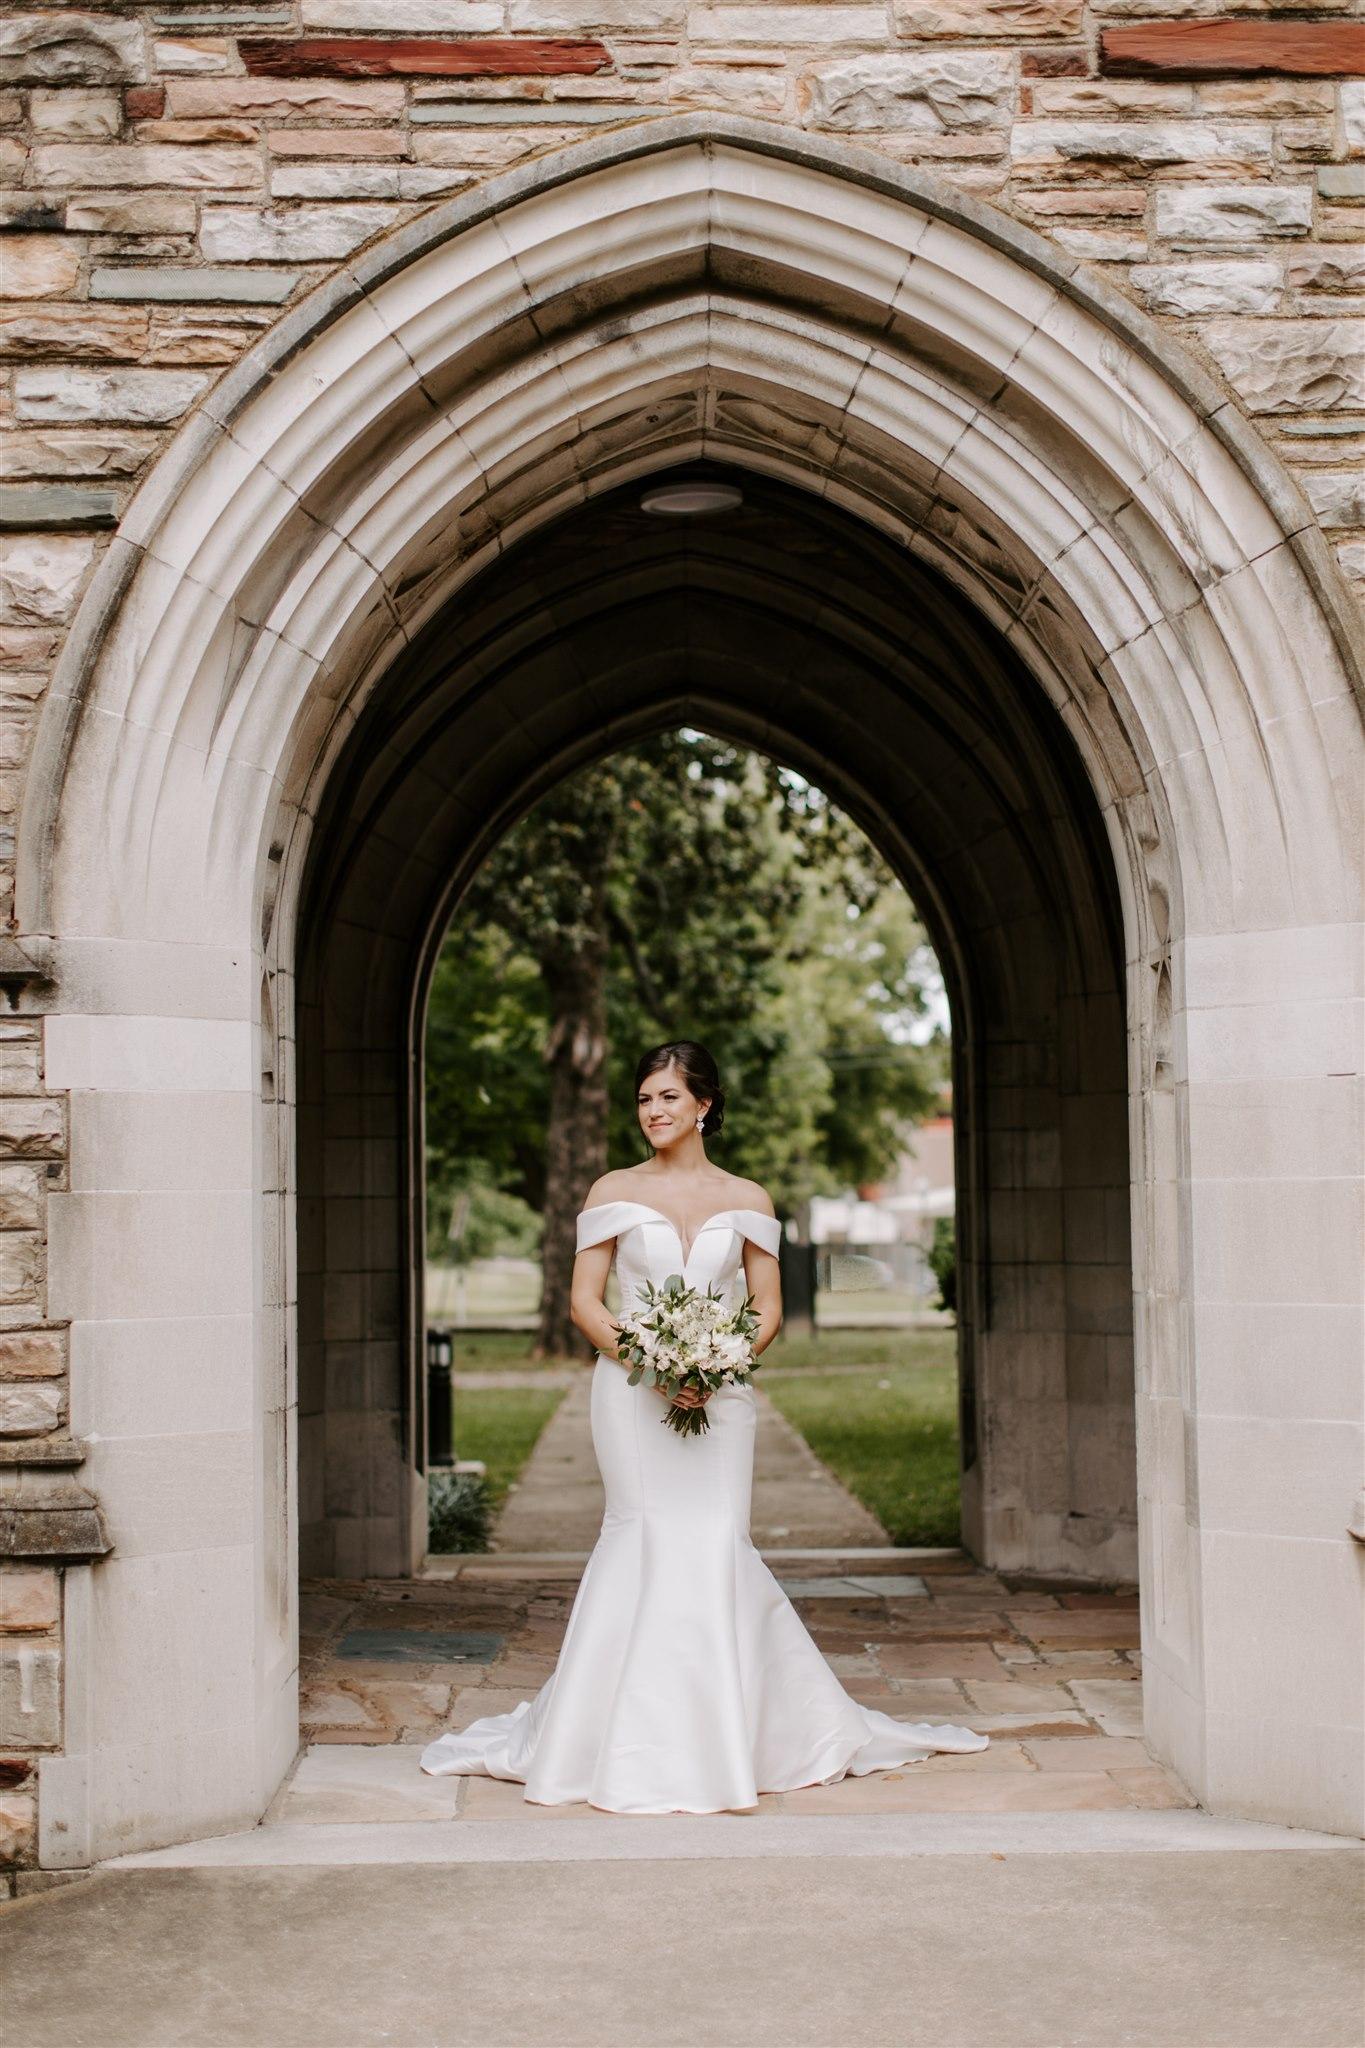 Bridal portrait by Caitlin Steva Photography